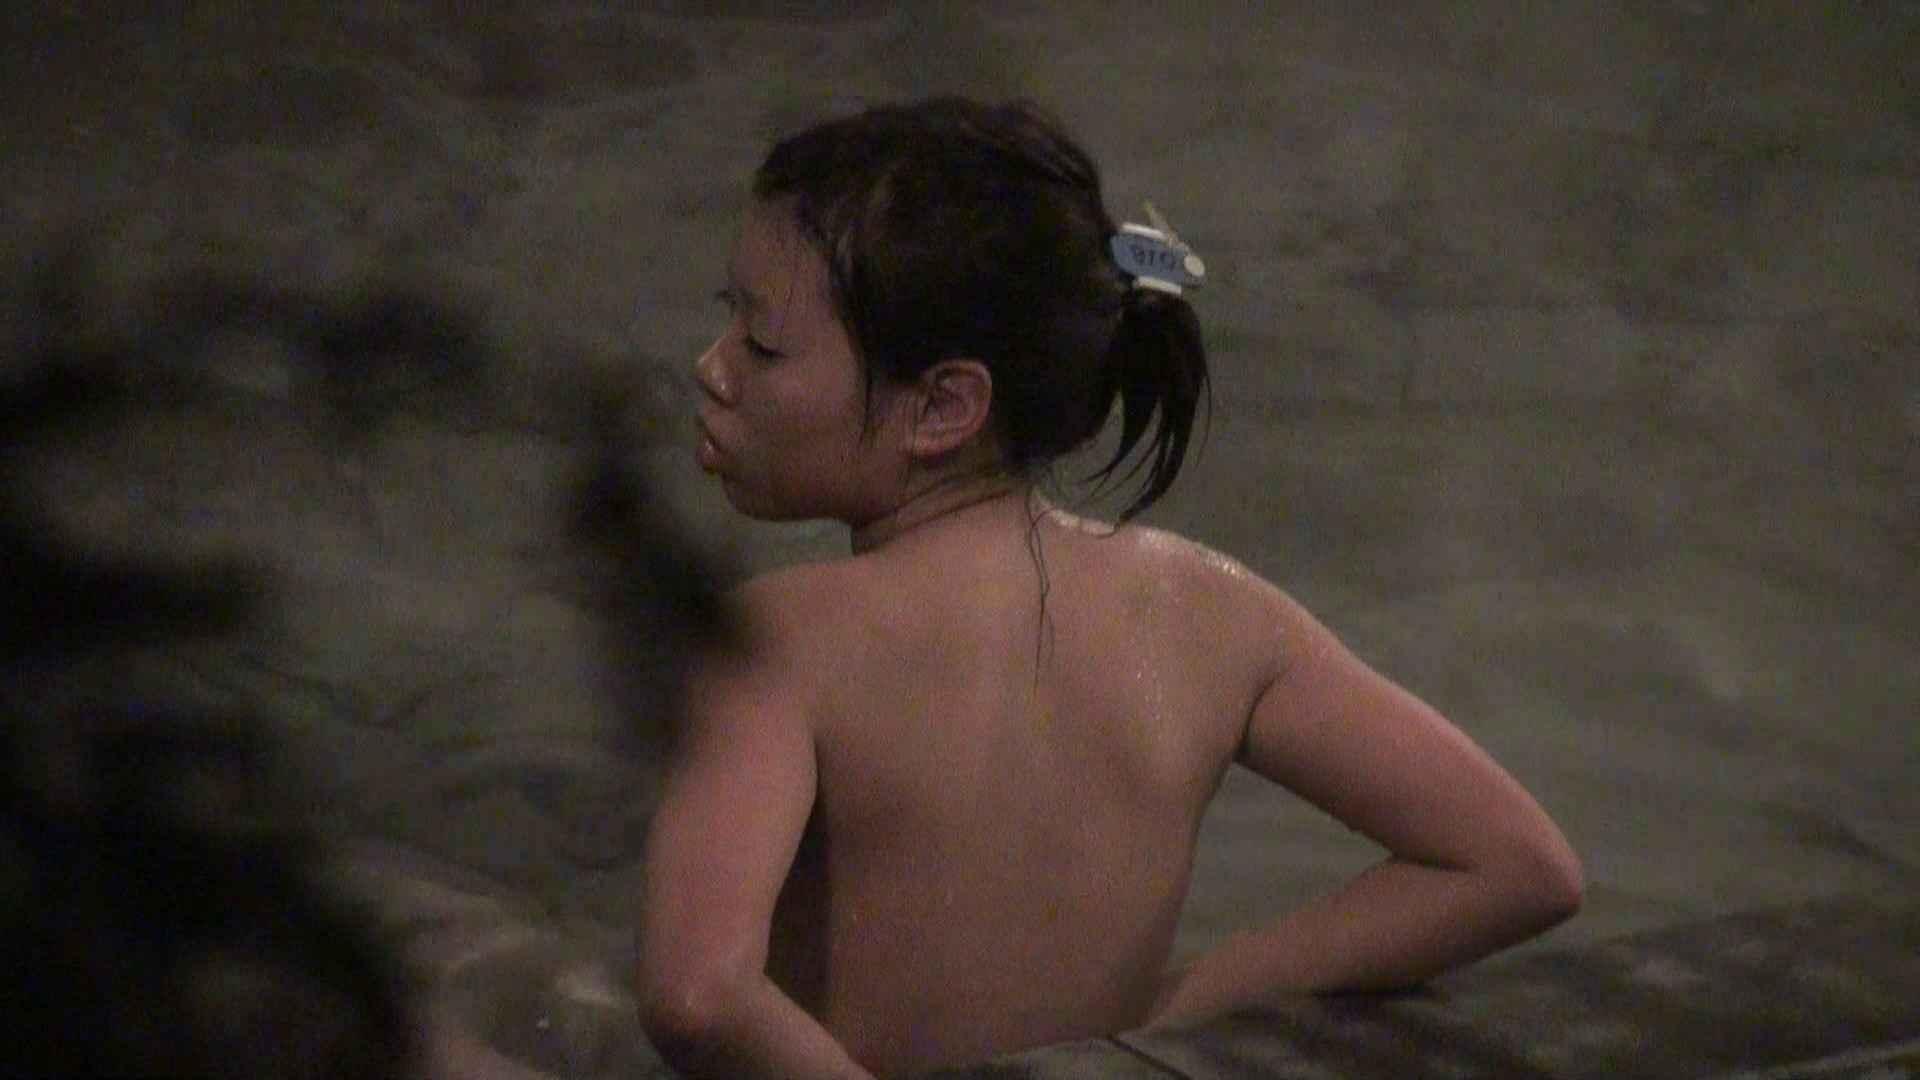 Aquaな露天風呂Vol.407 盗撮 ぱこり動画紹介 107画像 8